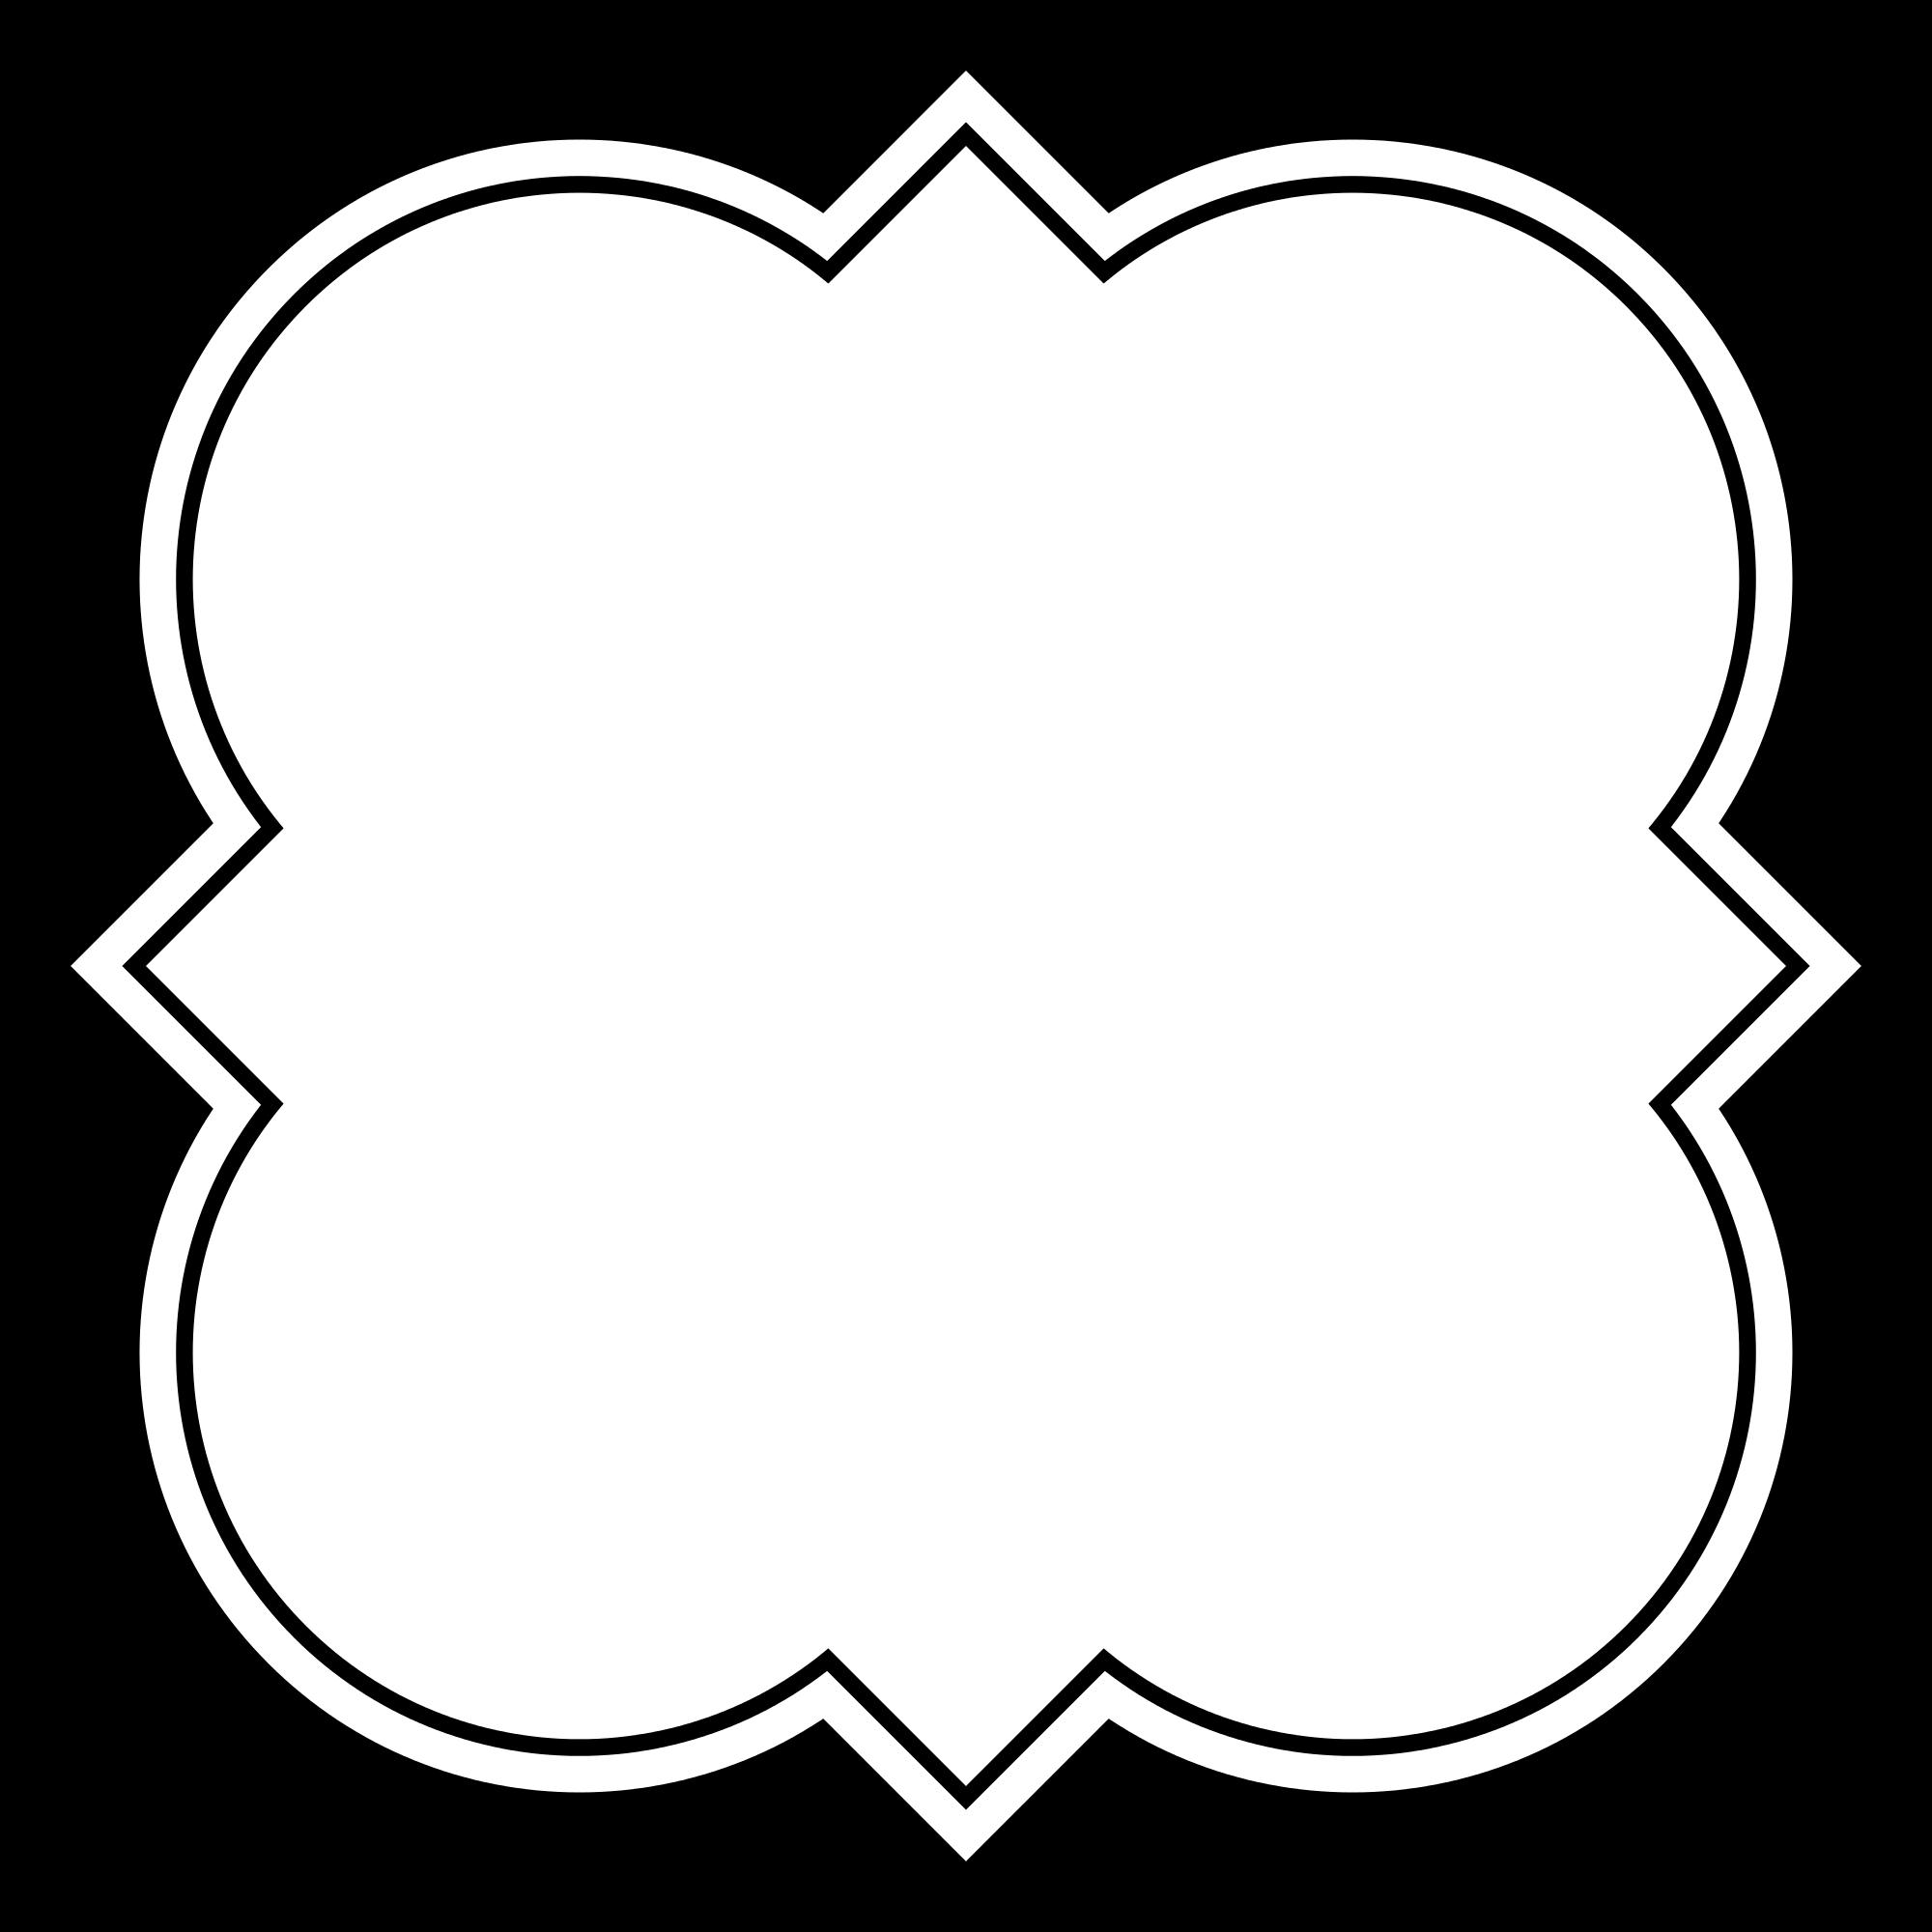 Quatrefoil png 4 » PNG Image.